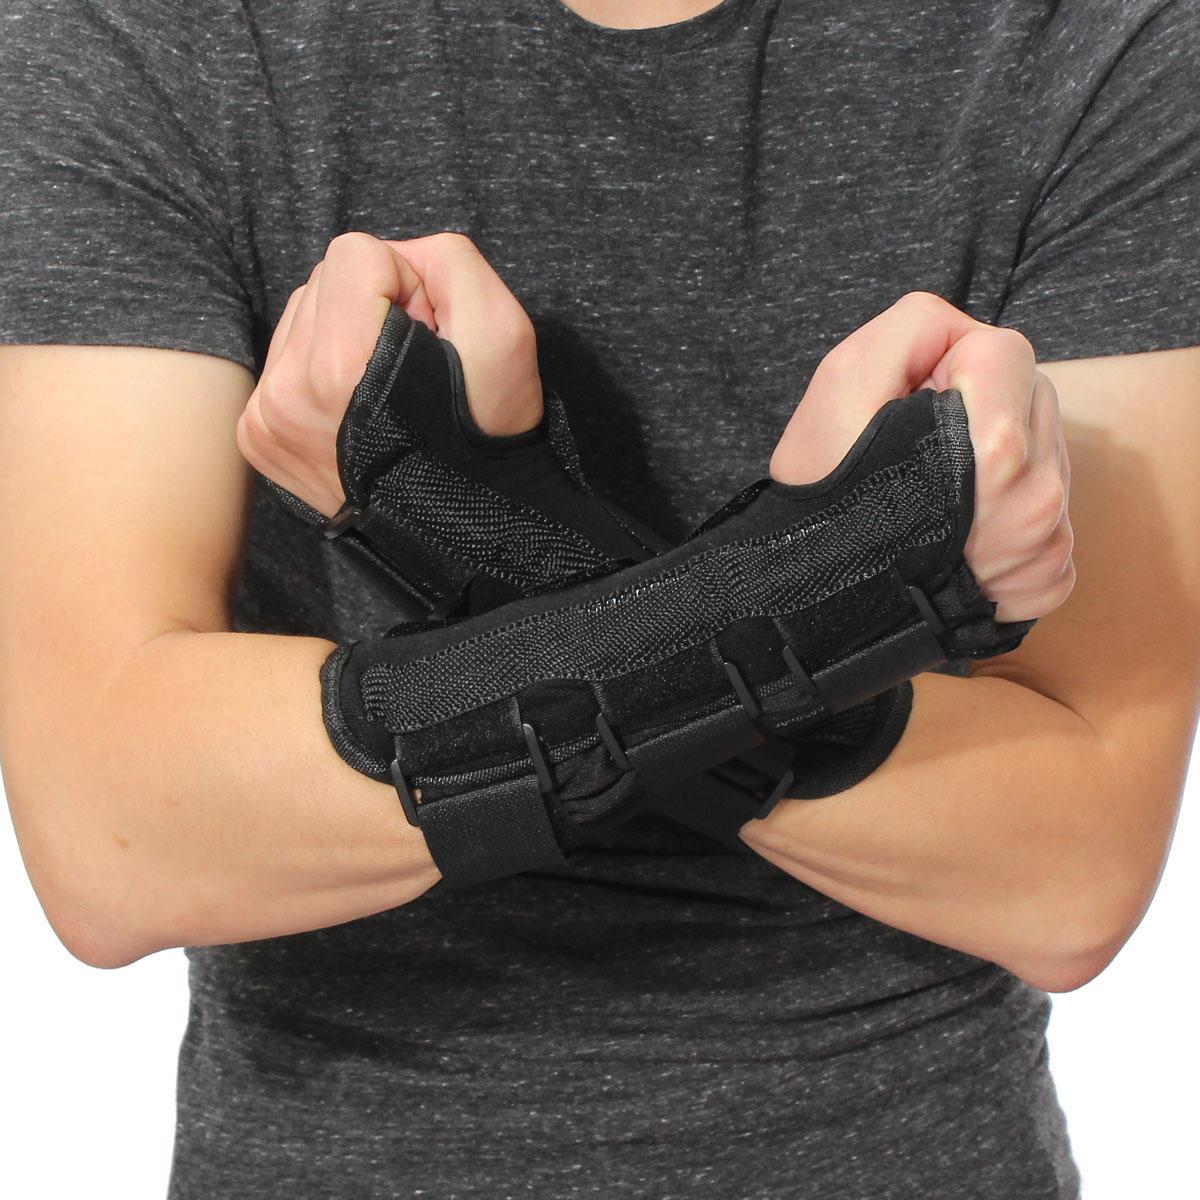 Wrist Splint Support Brace Fractures Carpal Tunnel Arthritis Sprain Band